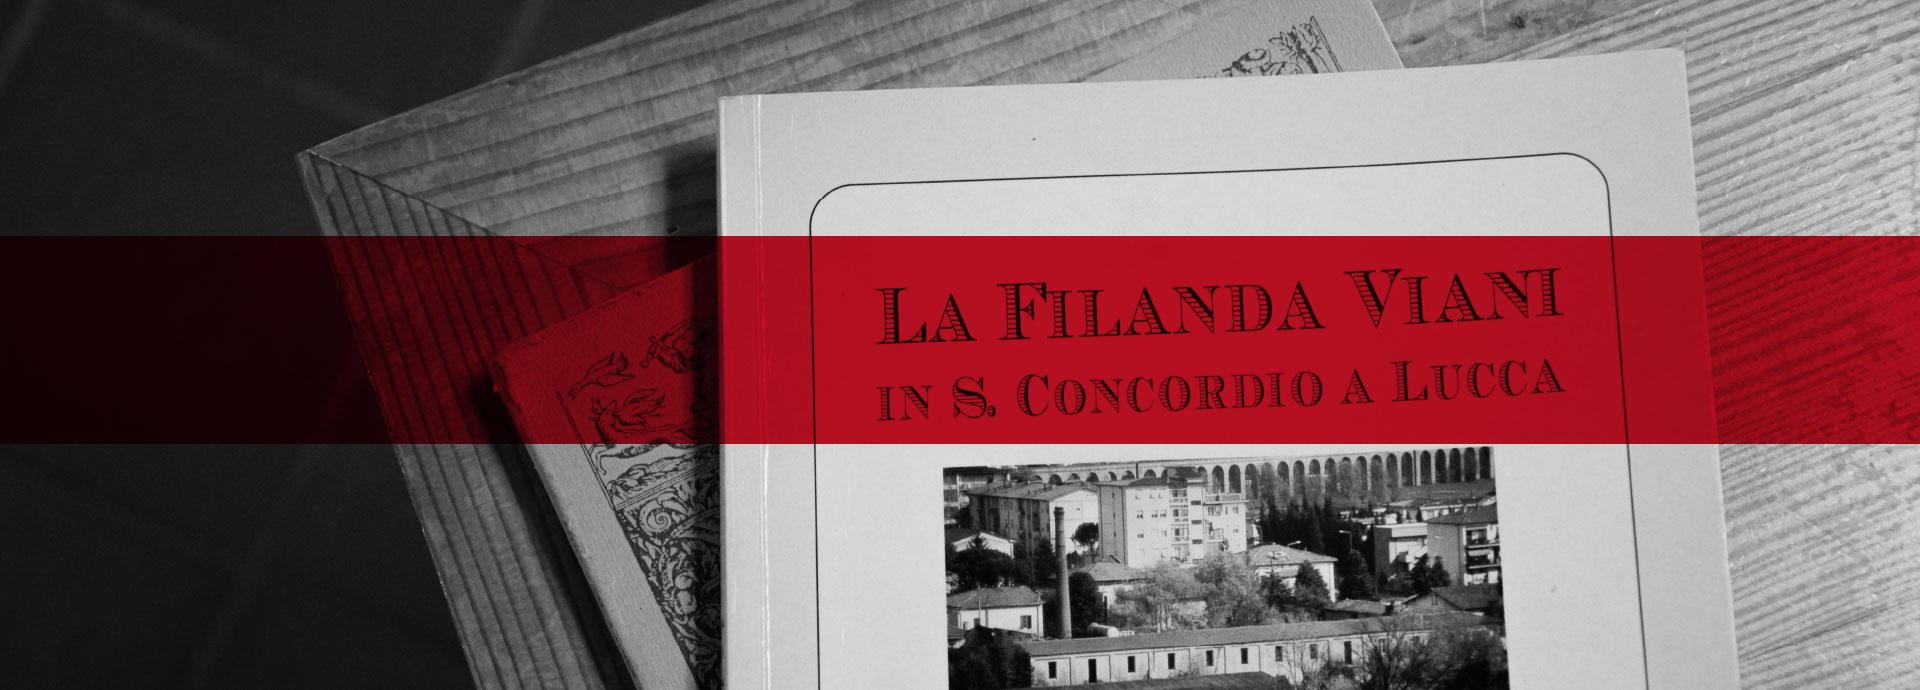 La Filanda Viani in San Concordio a Lucca